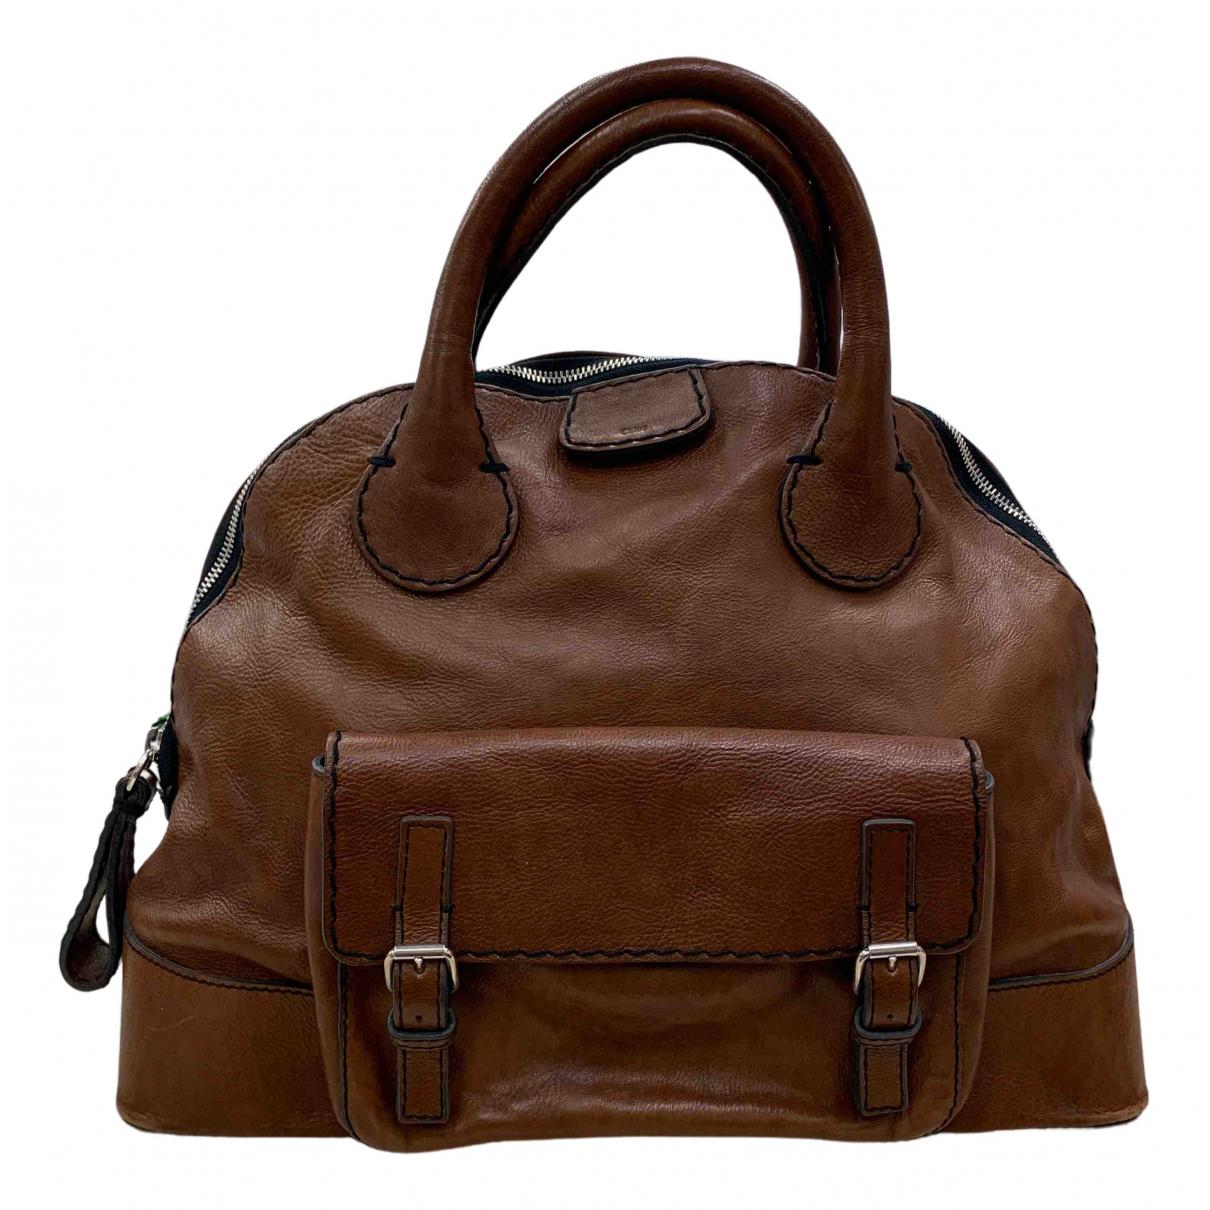 Chloé Edith Brown Leather handbag for Women \N